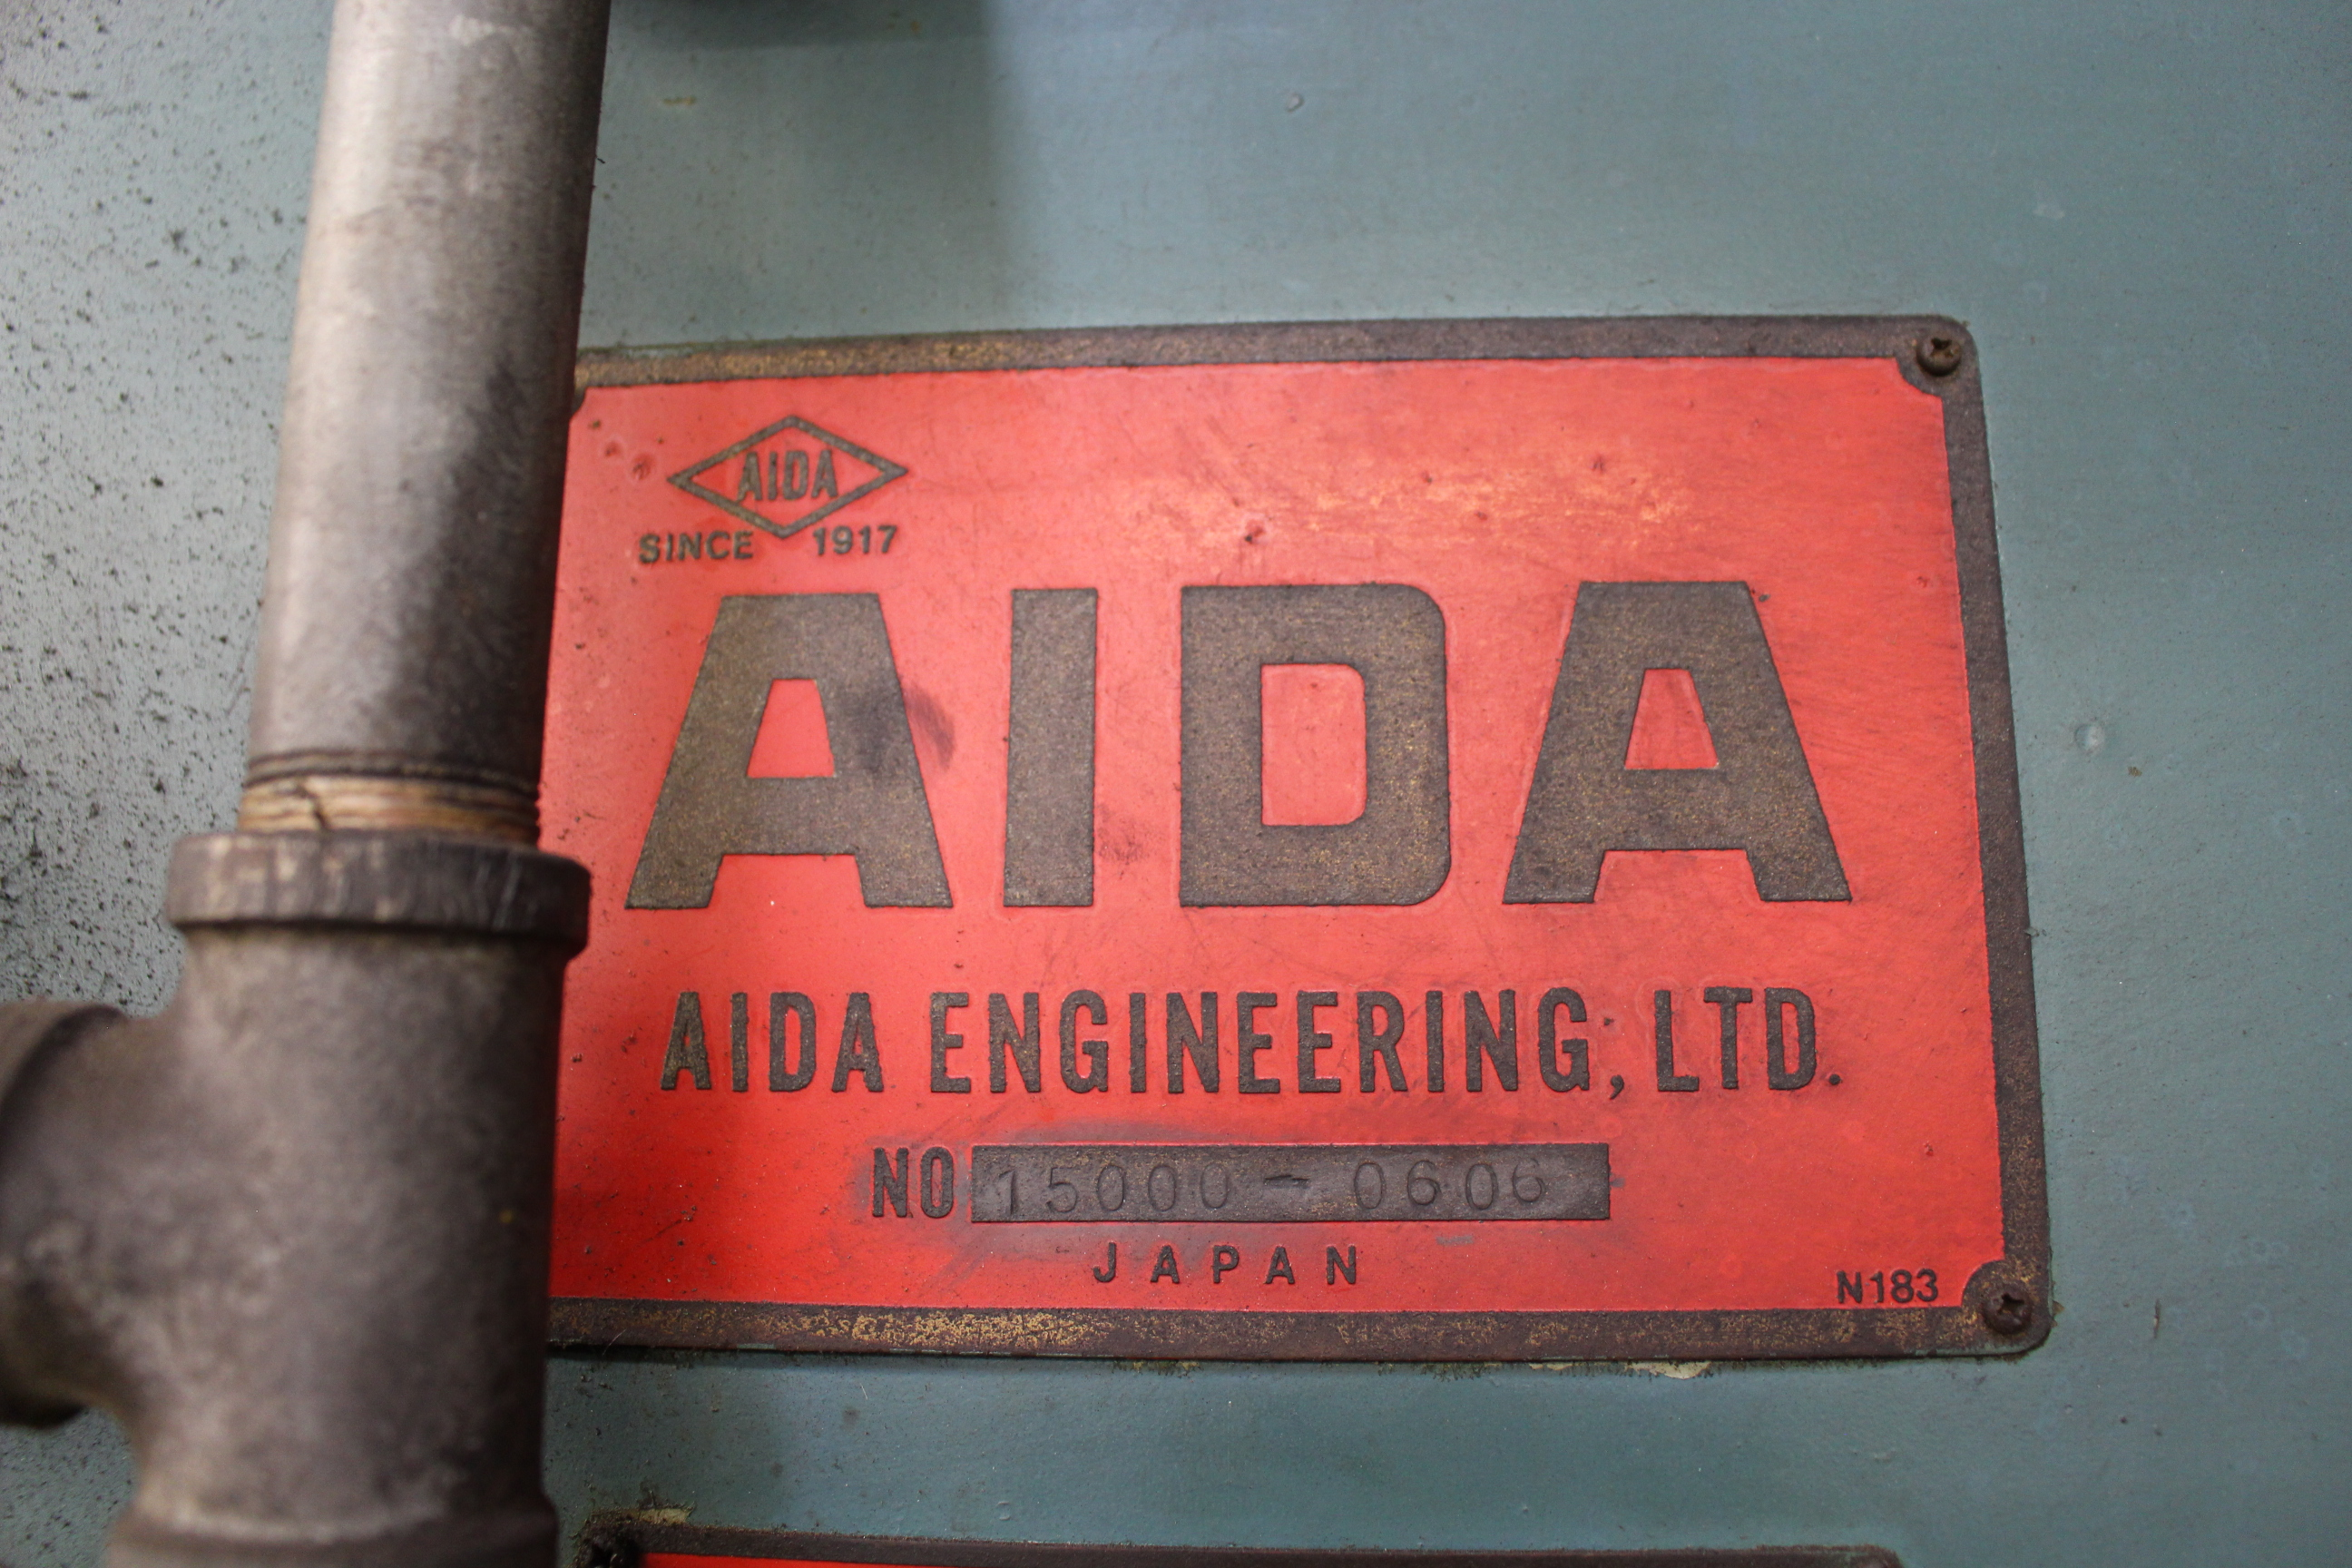 "AIDA MODEL PC-30 PUNCH PRESS, 300 TON CAPACITY,AIR CUSHION, 15.7"" STROKE, 30 SPM, 70"" X 30"" - Image 21 of 21"